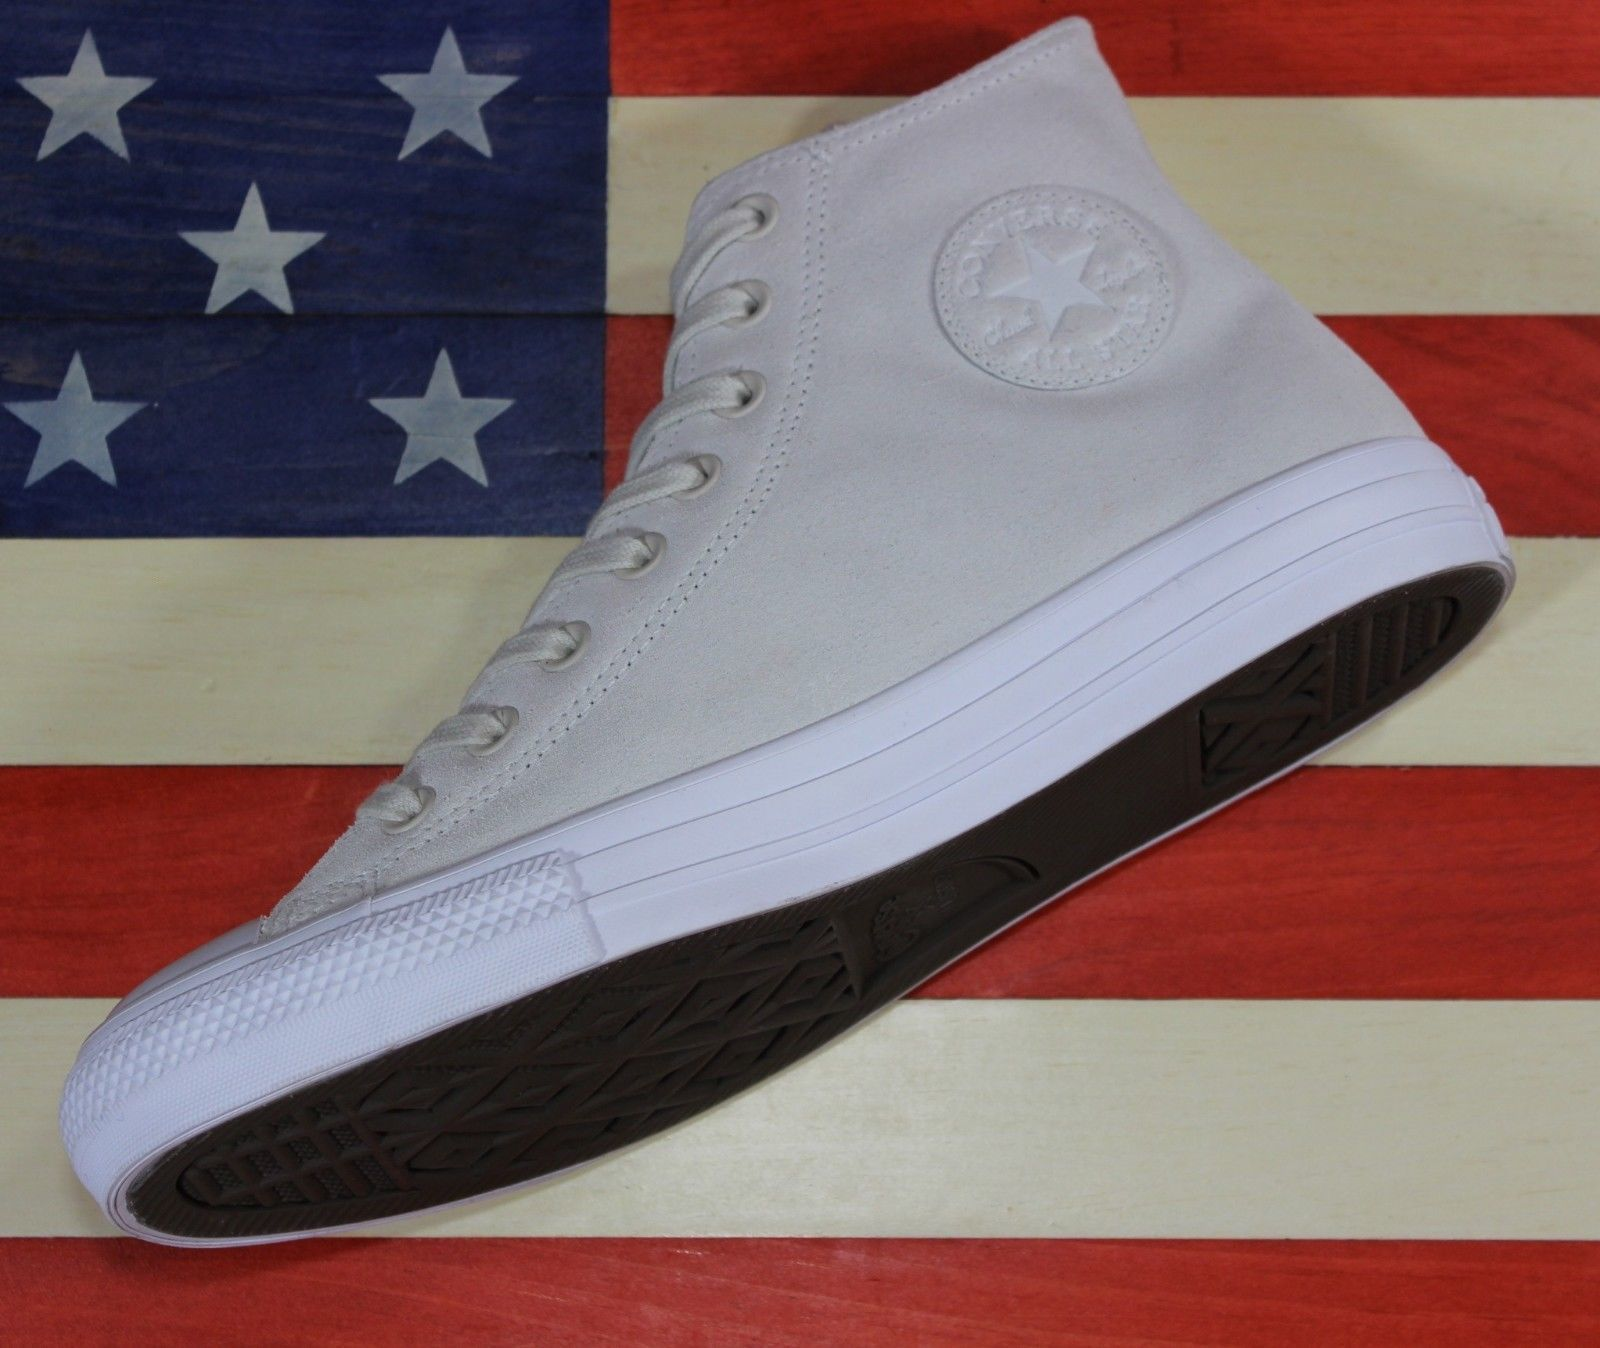 fddd3b4f41aa S l1600. S l1600. Previous. CONVERSE SAMPLE Chuck Taylor ALL-STAR HI Plush  Suede White Shoe  157519C  Mens · CONVERSE SAMPLE ...